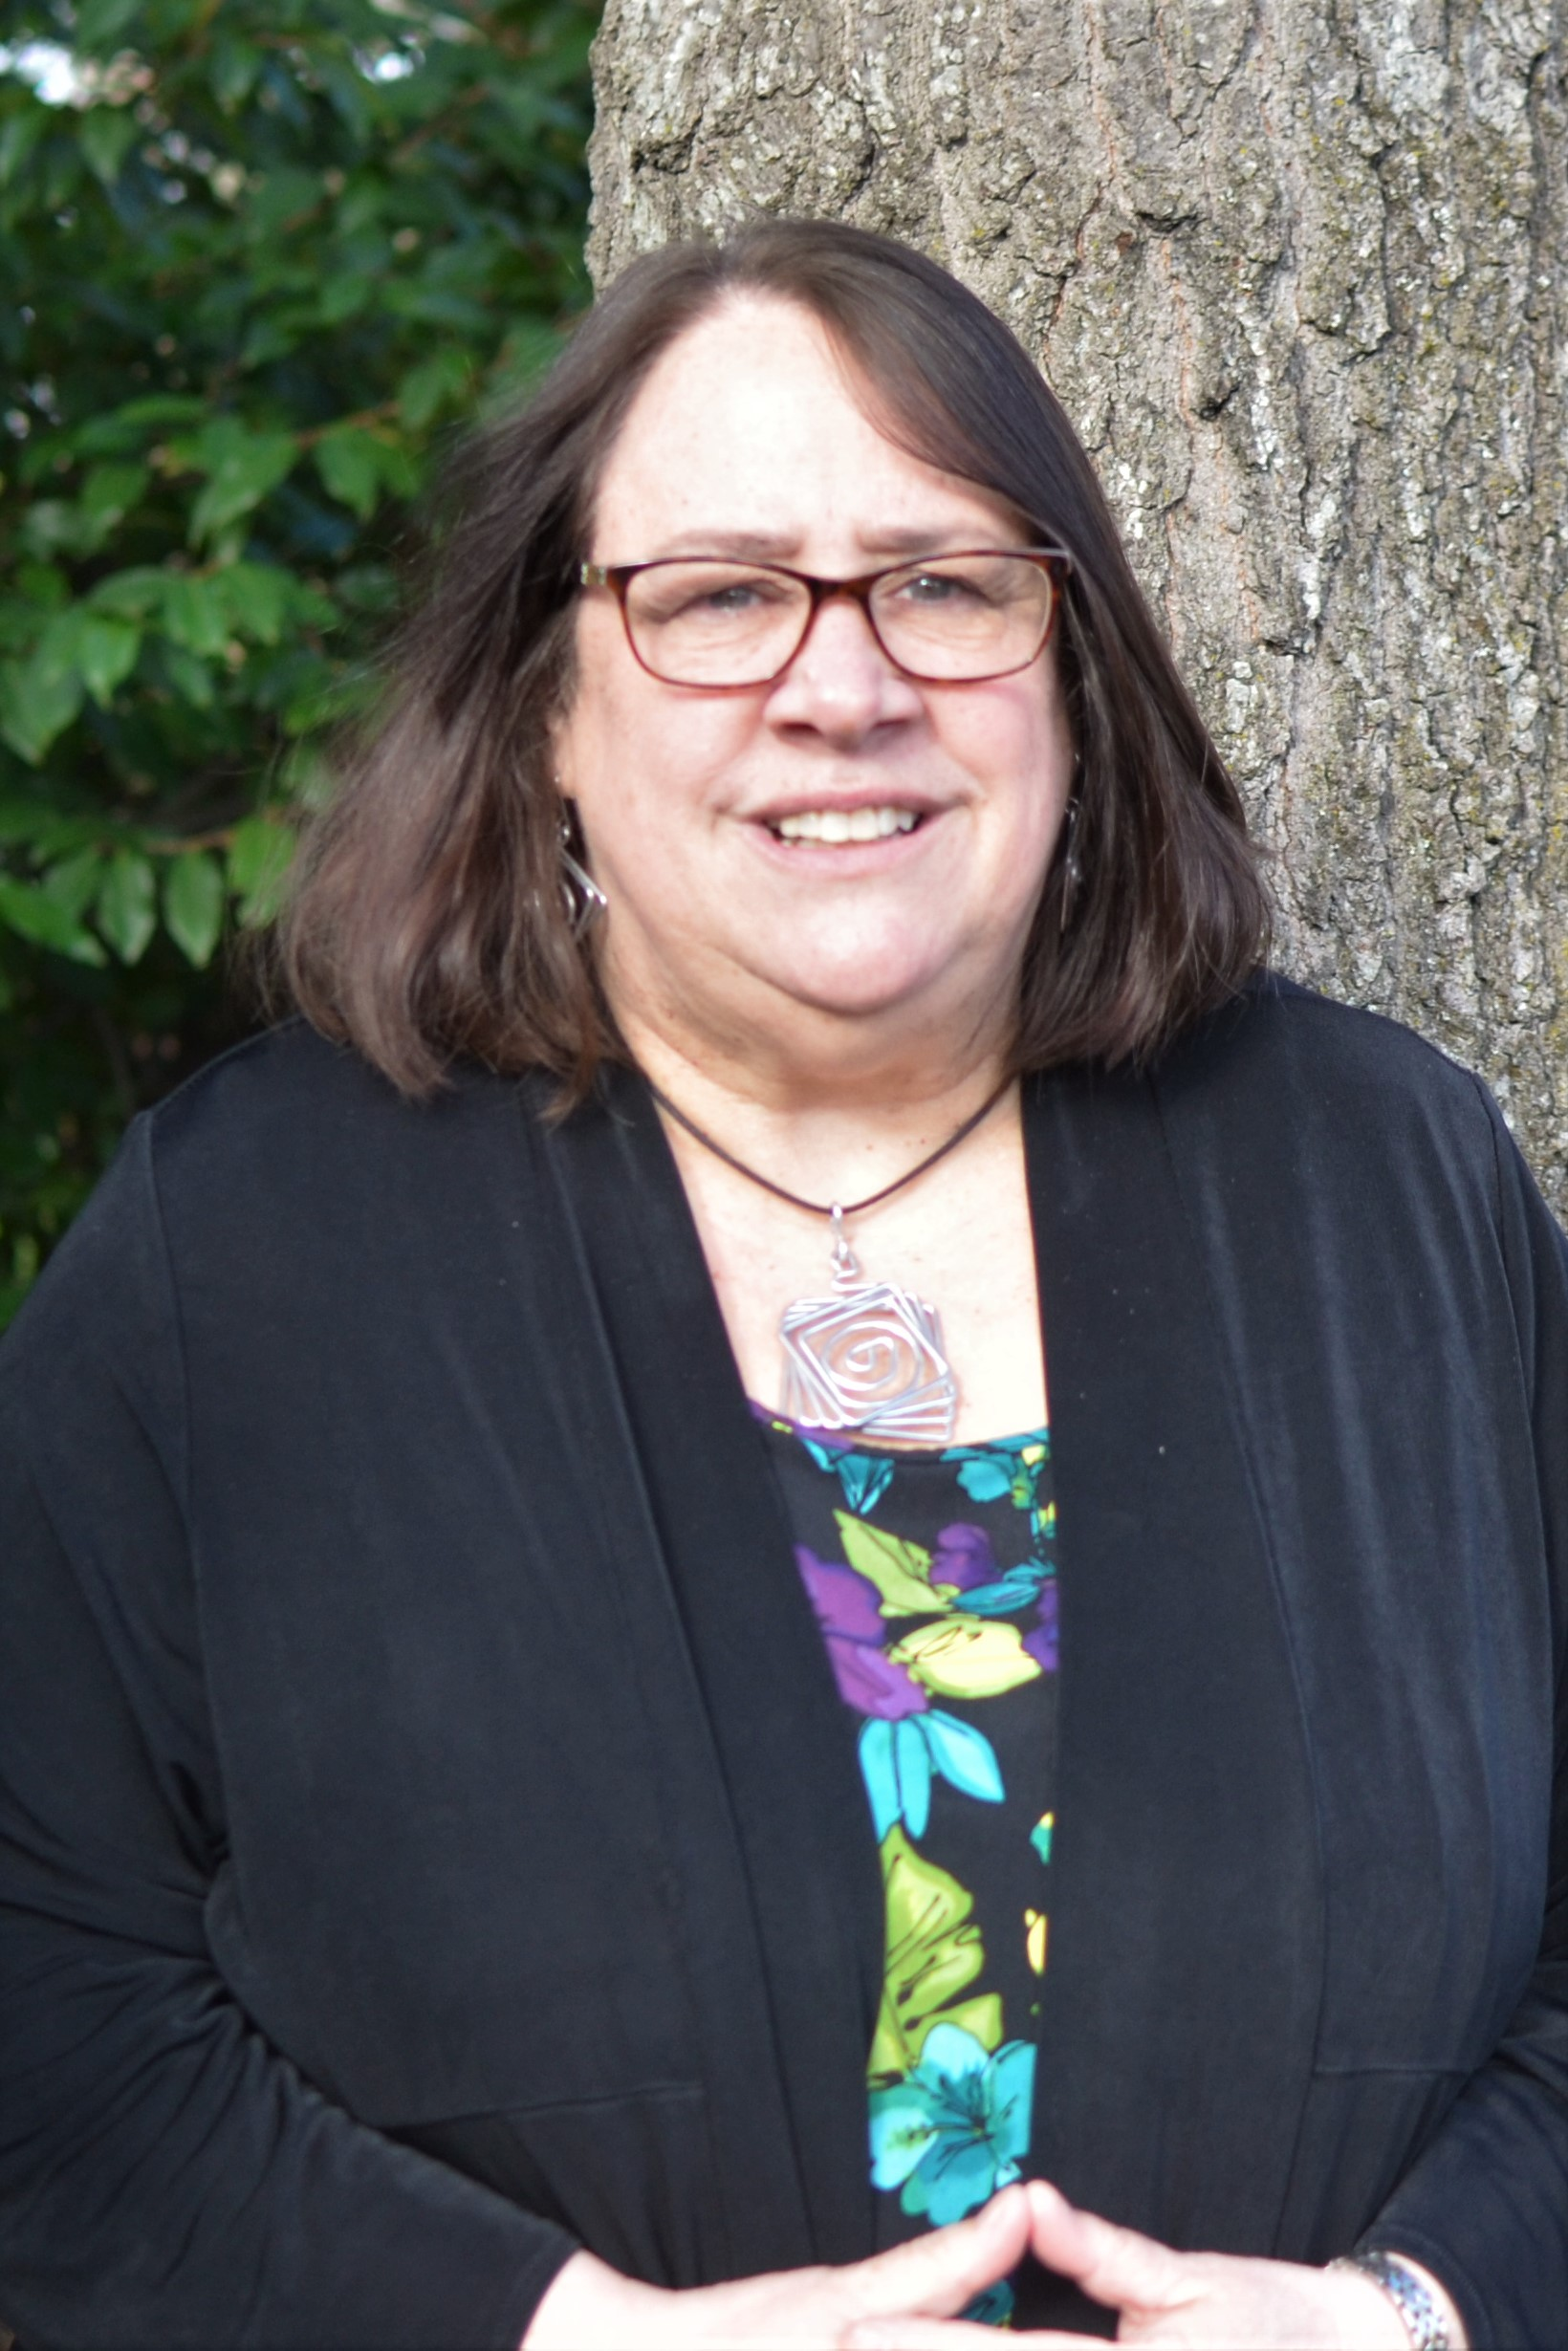 Photo of Lore Rutz-Burri, CCJ Faculty